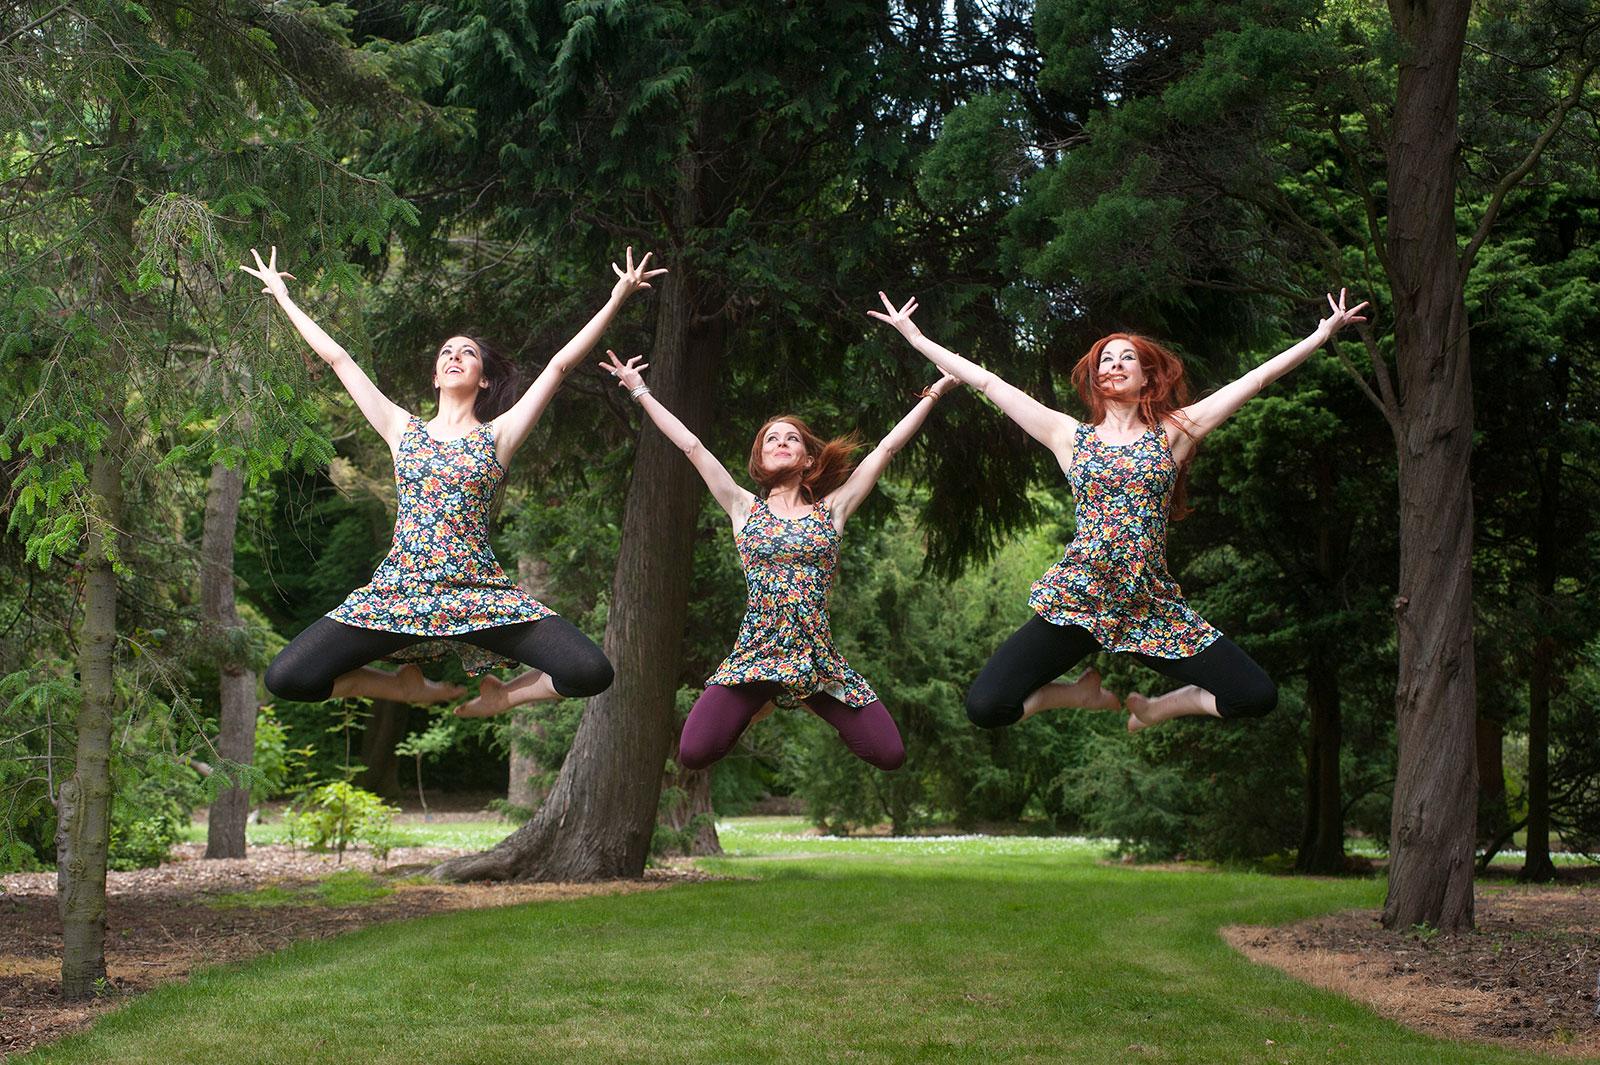 Promo shoot in the Botanical gardens, Edinburgh for Dance Ihayami